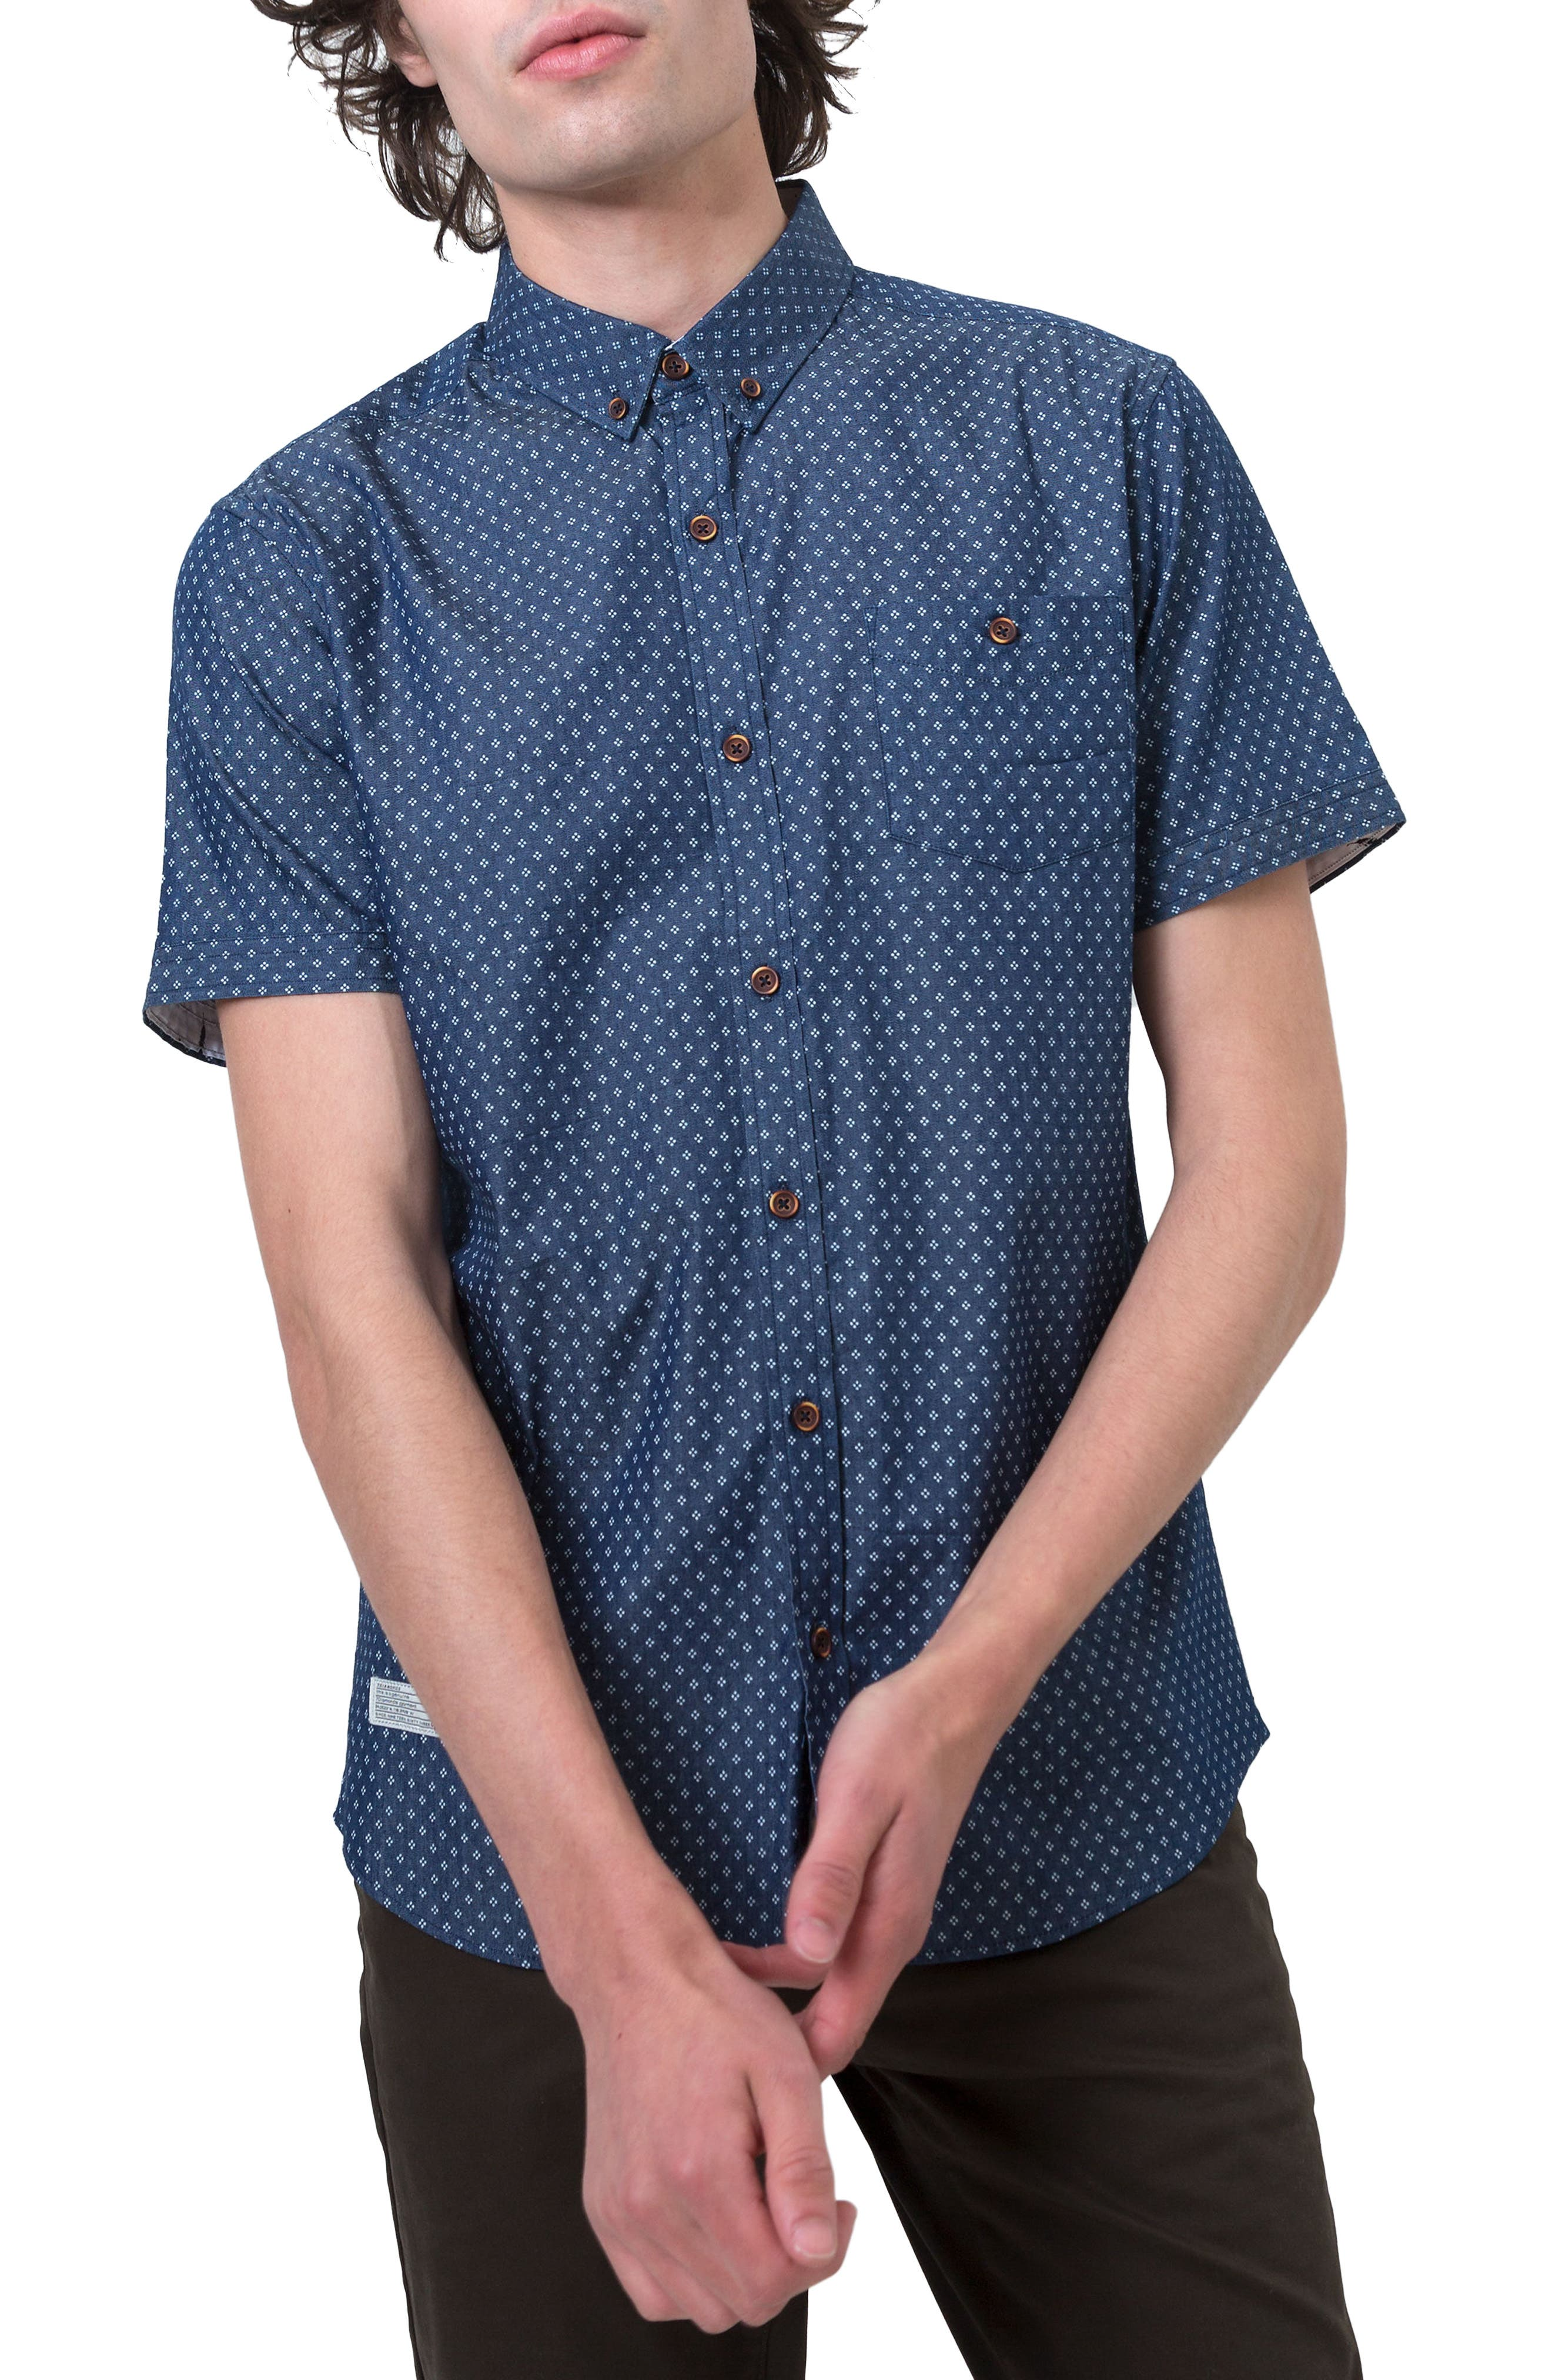 7 DIAMONDS Livewire Trim Fit Print Short Sleeve Woven Shirt